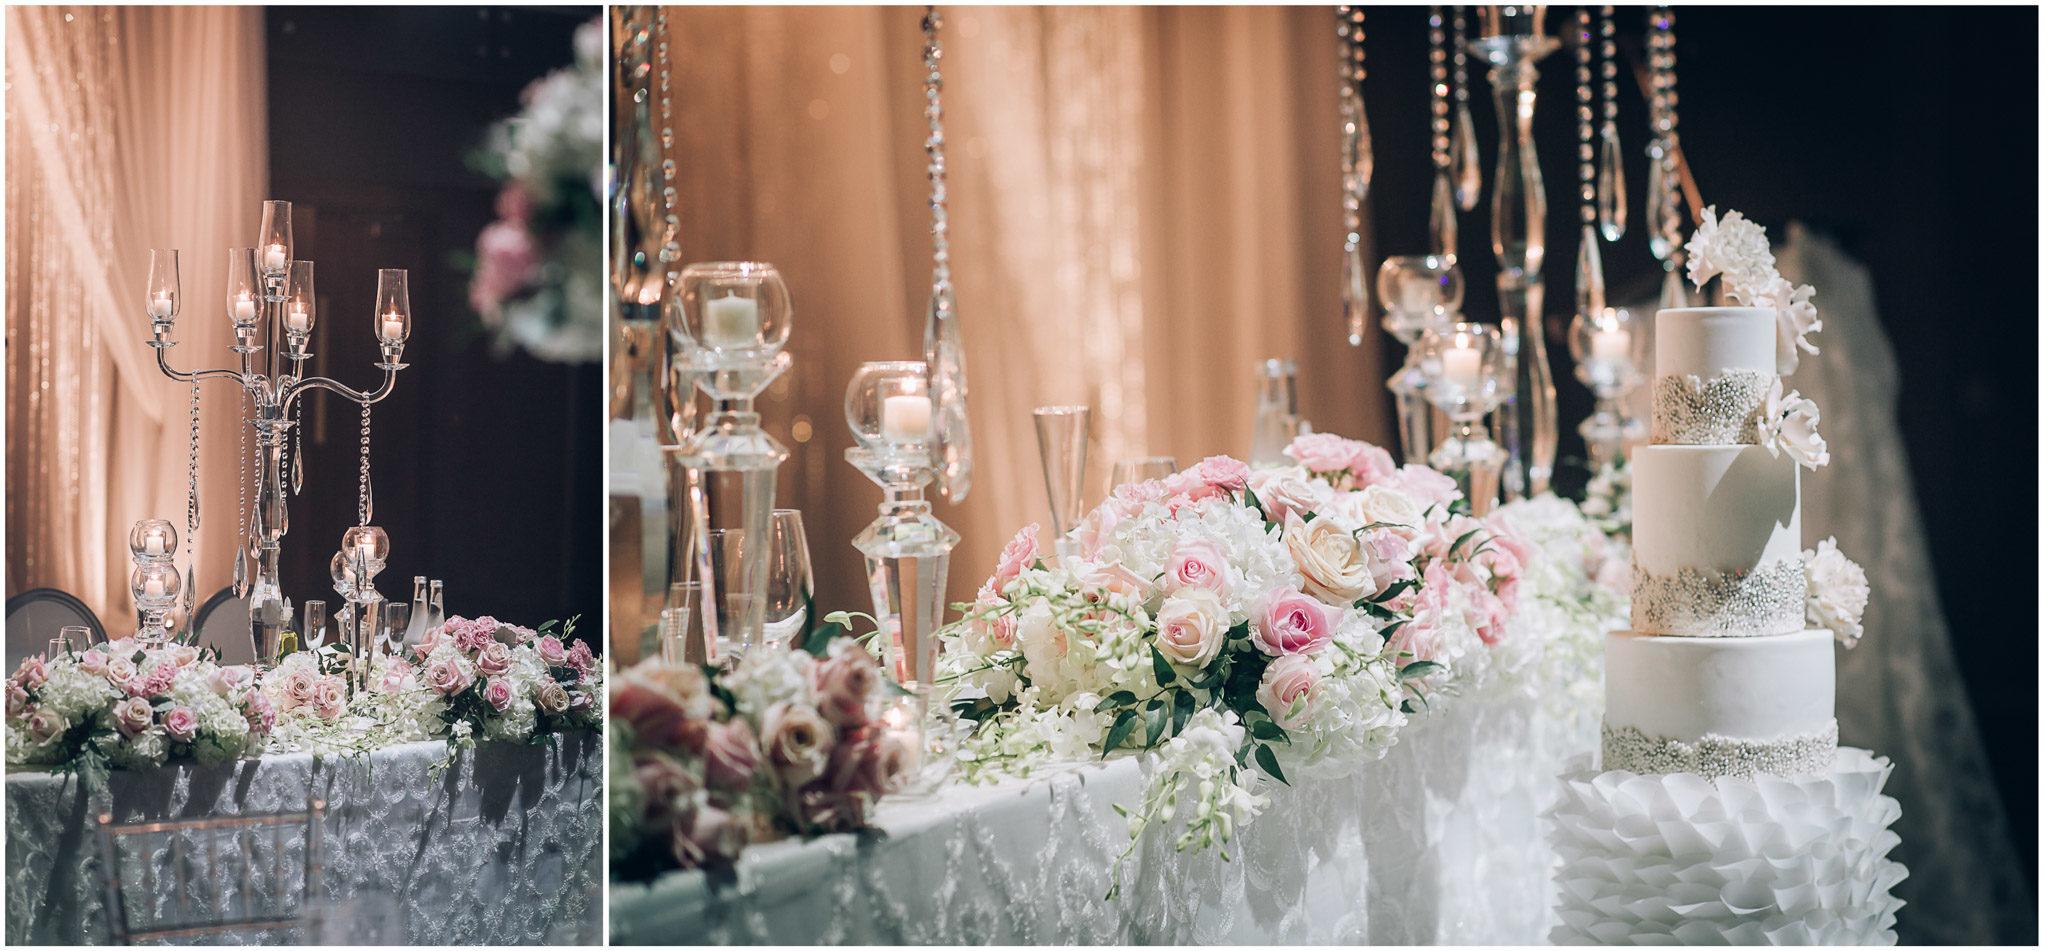 wedding-reception-universal-event-space-2